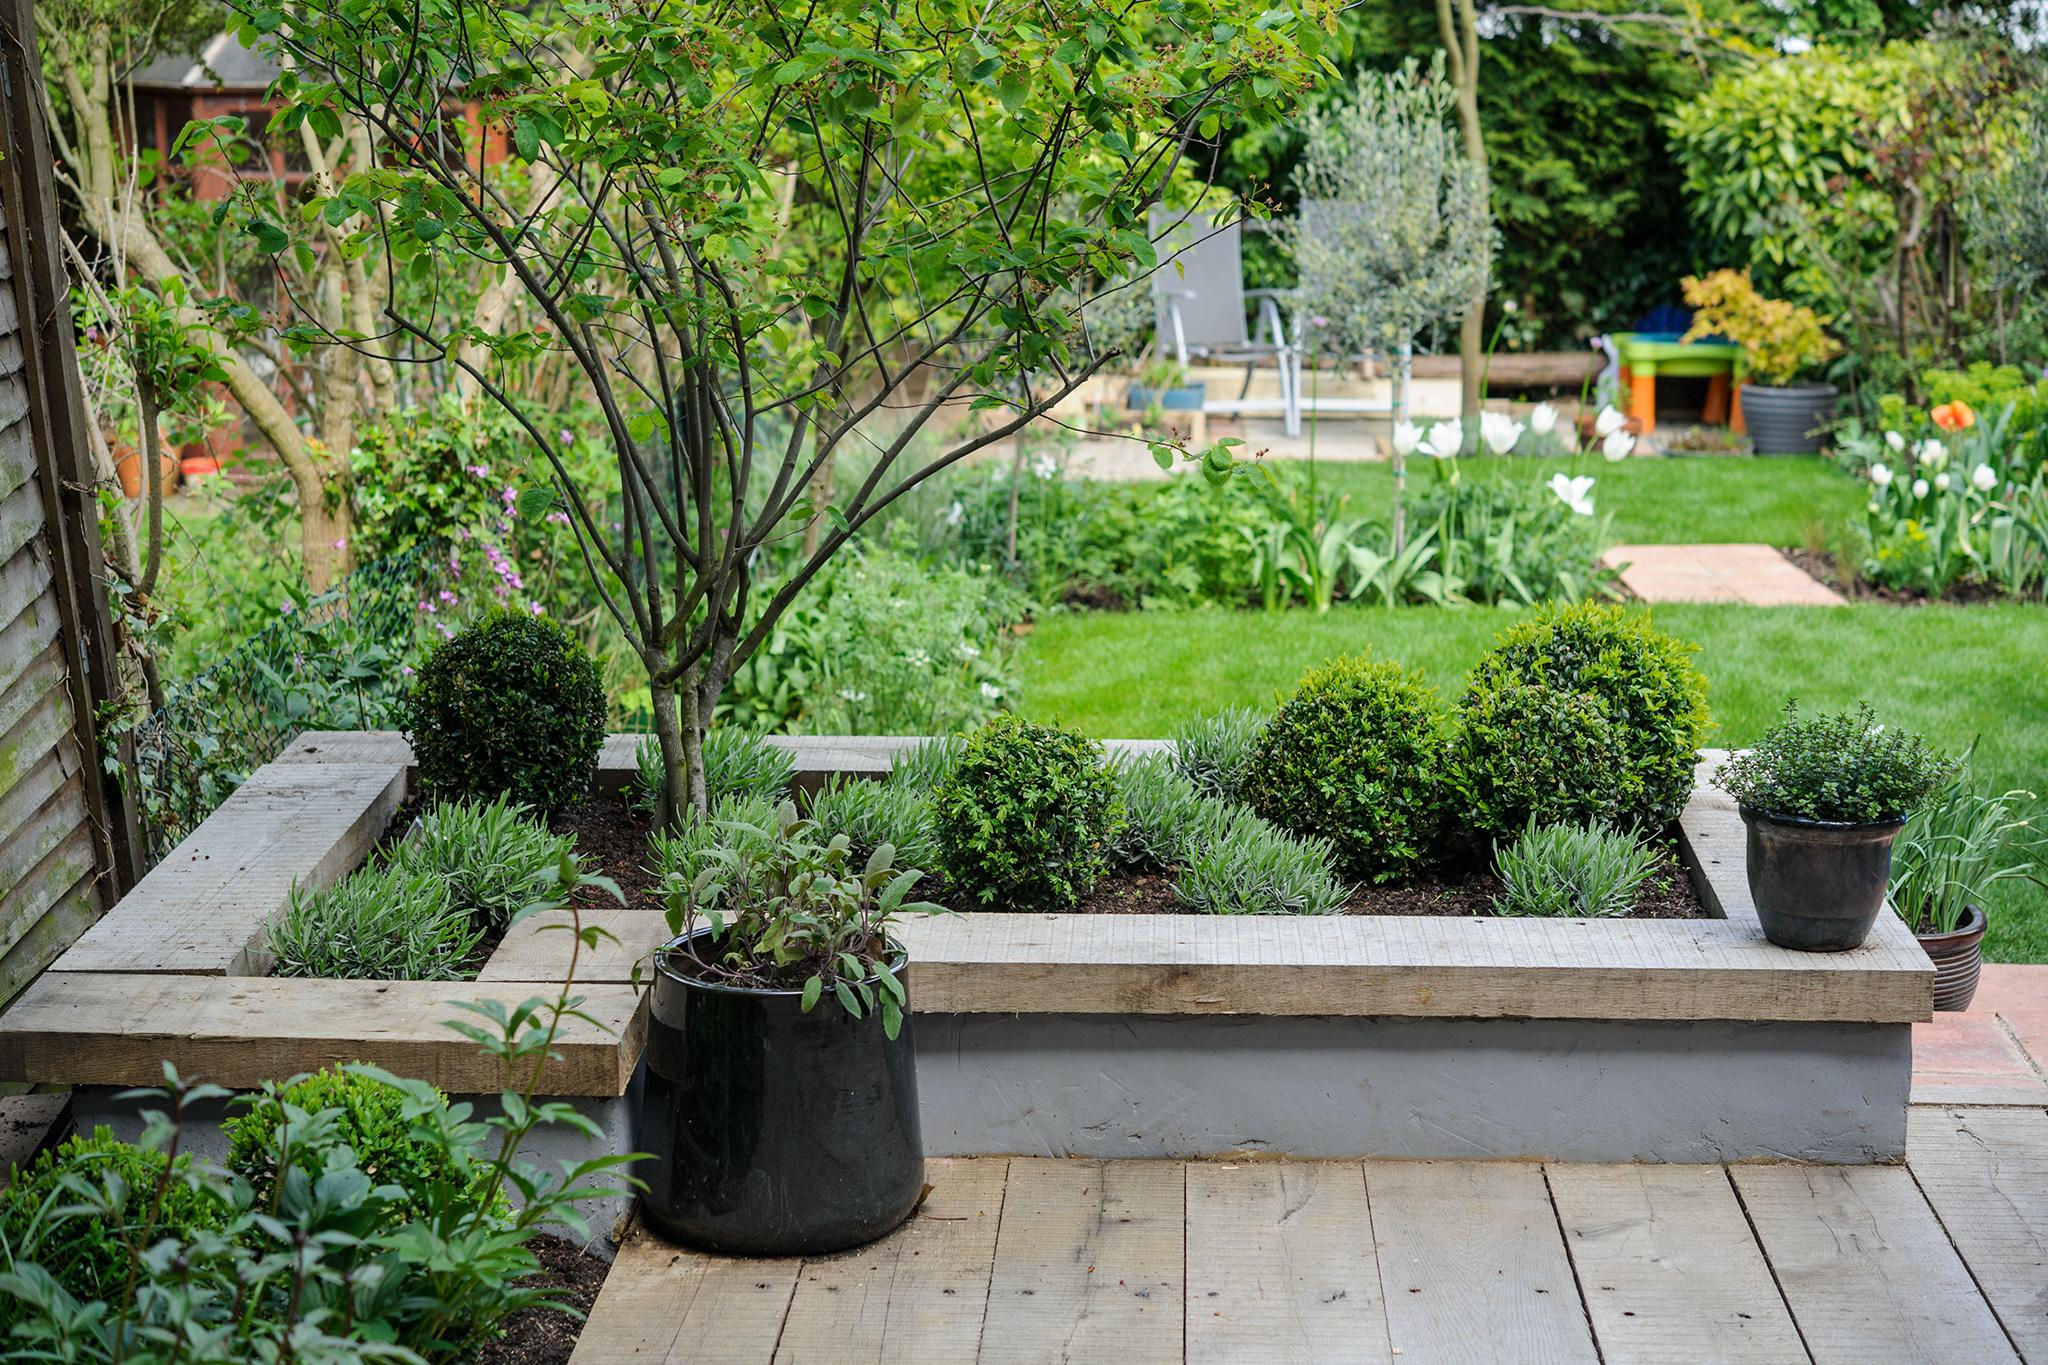 12 Tips for a Dog-Friendly Garden - gardenersworld.com